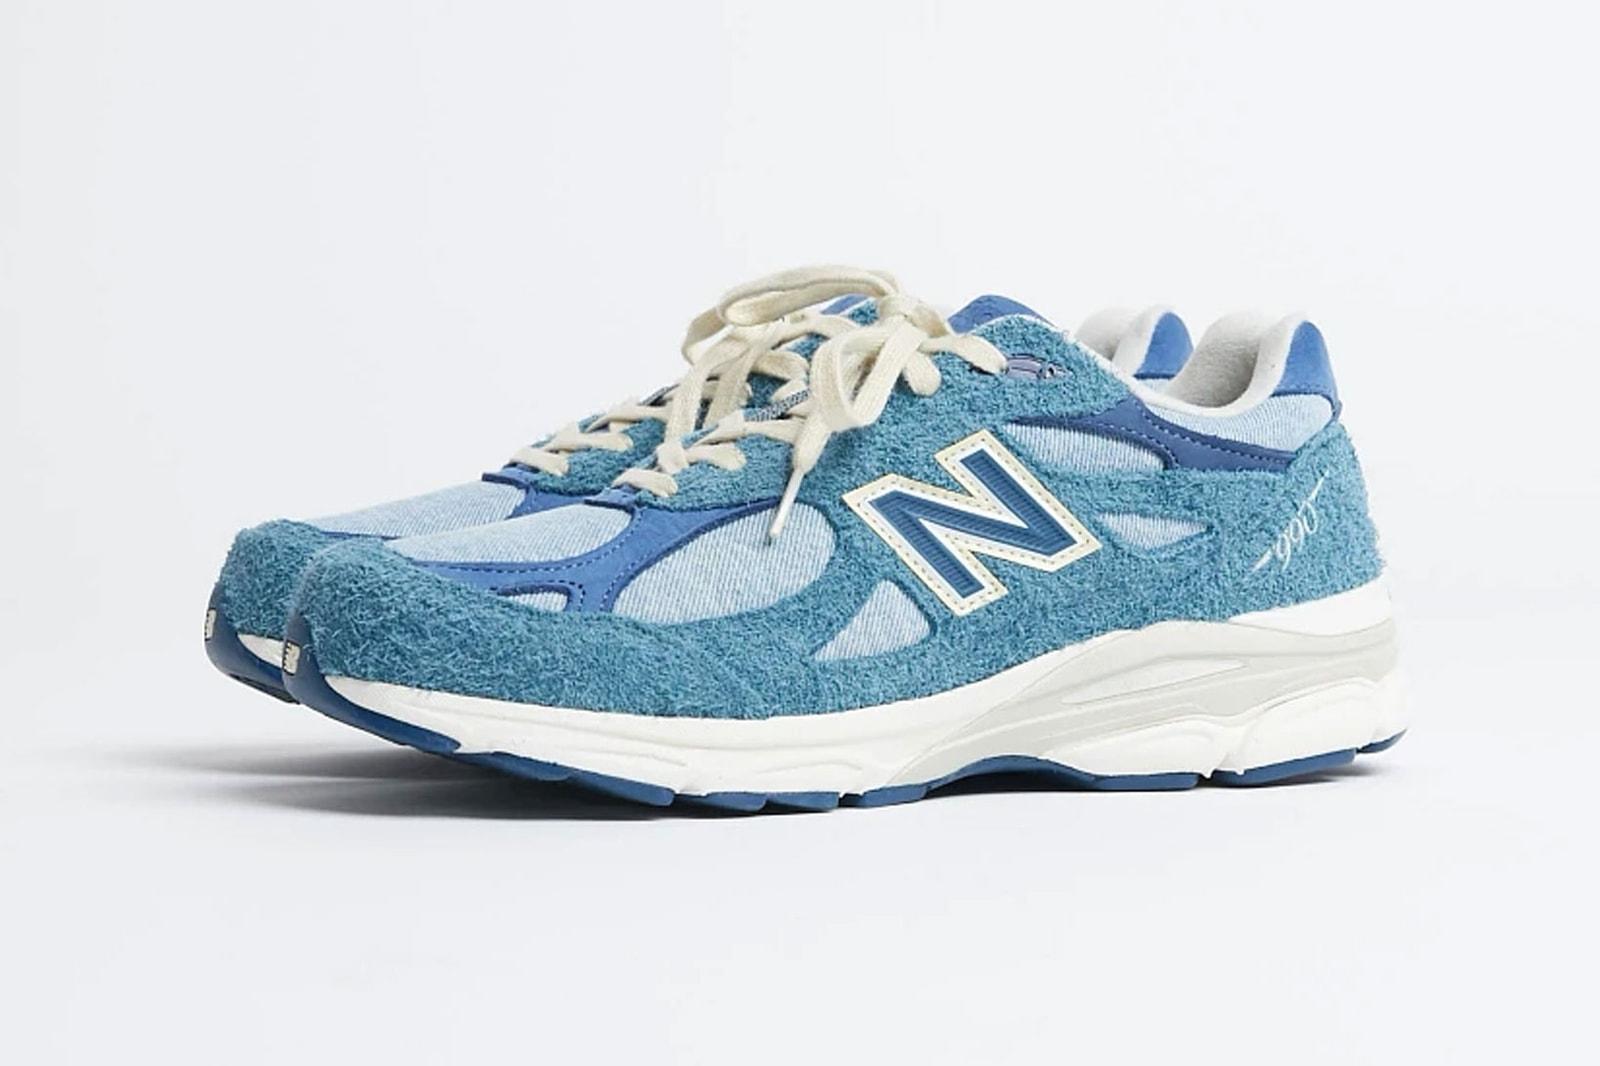 levis new balance nb 990v3 denim collaboration blue sneakers release info